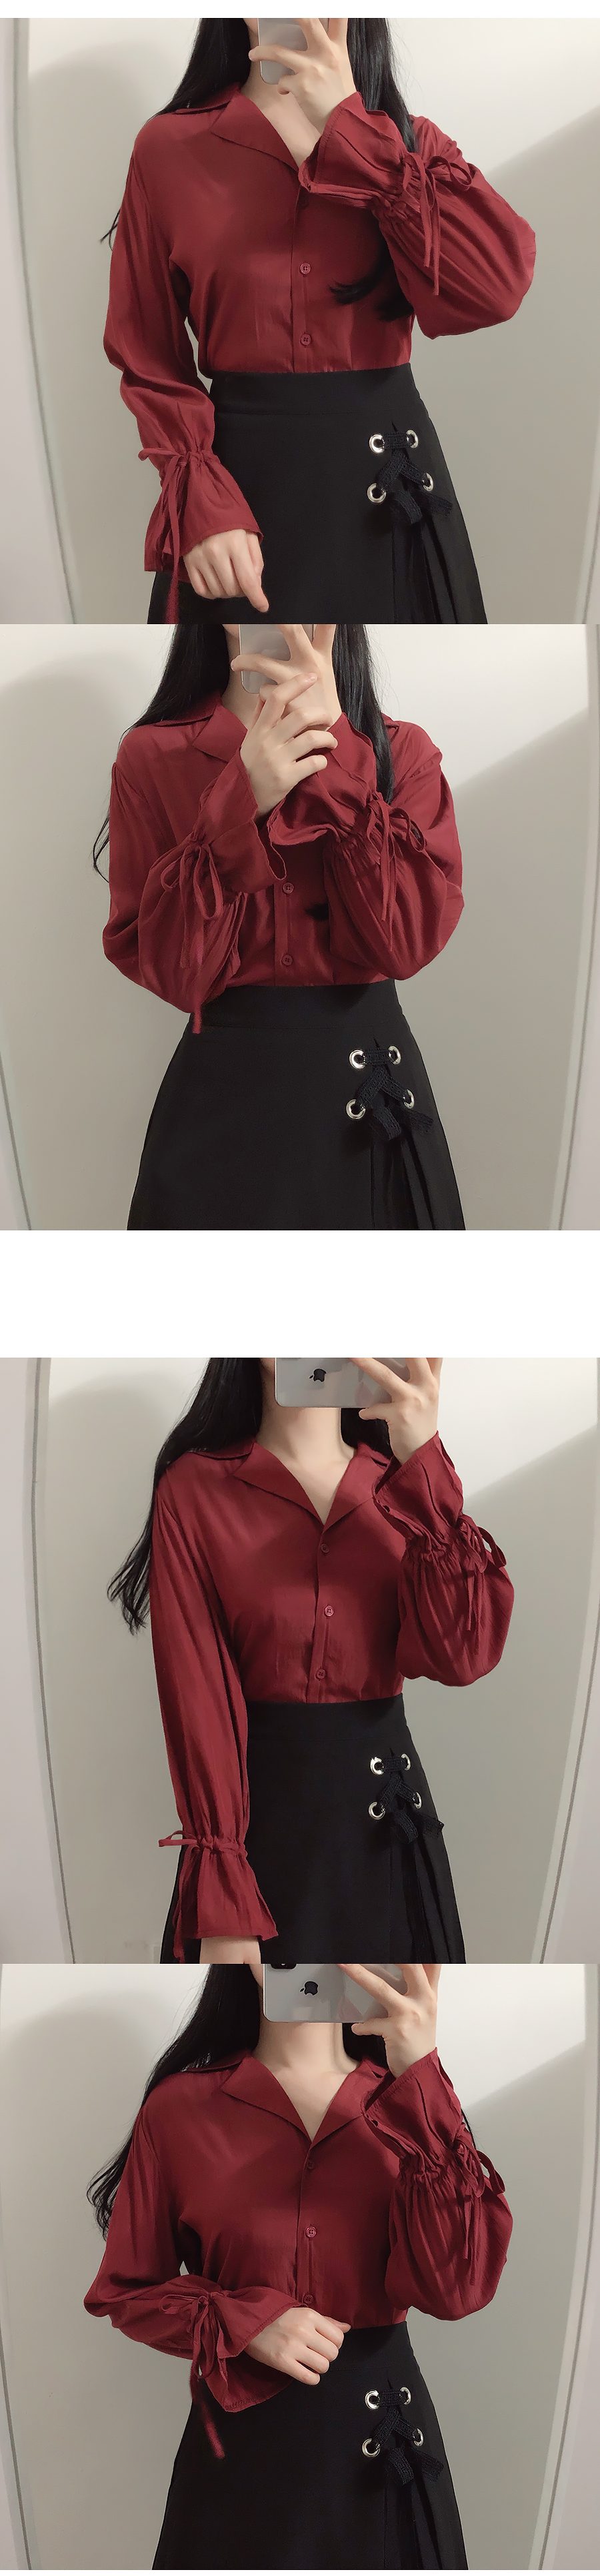 ♥ Brick collar blouse